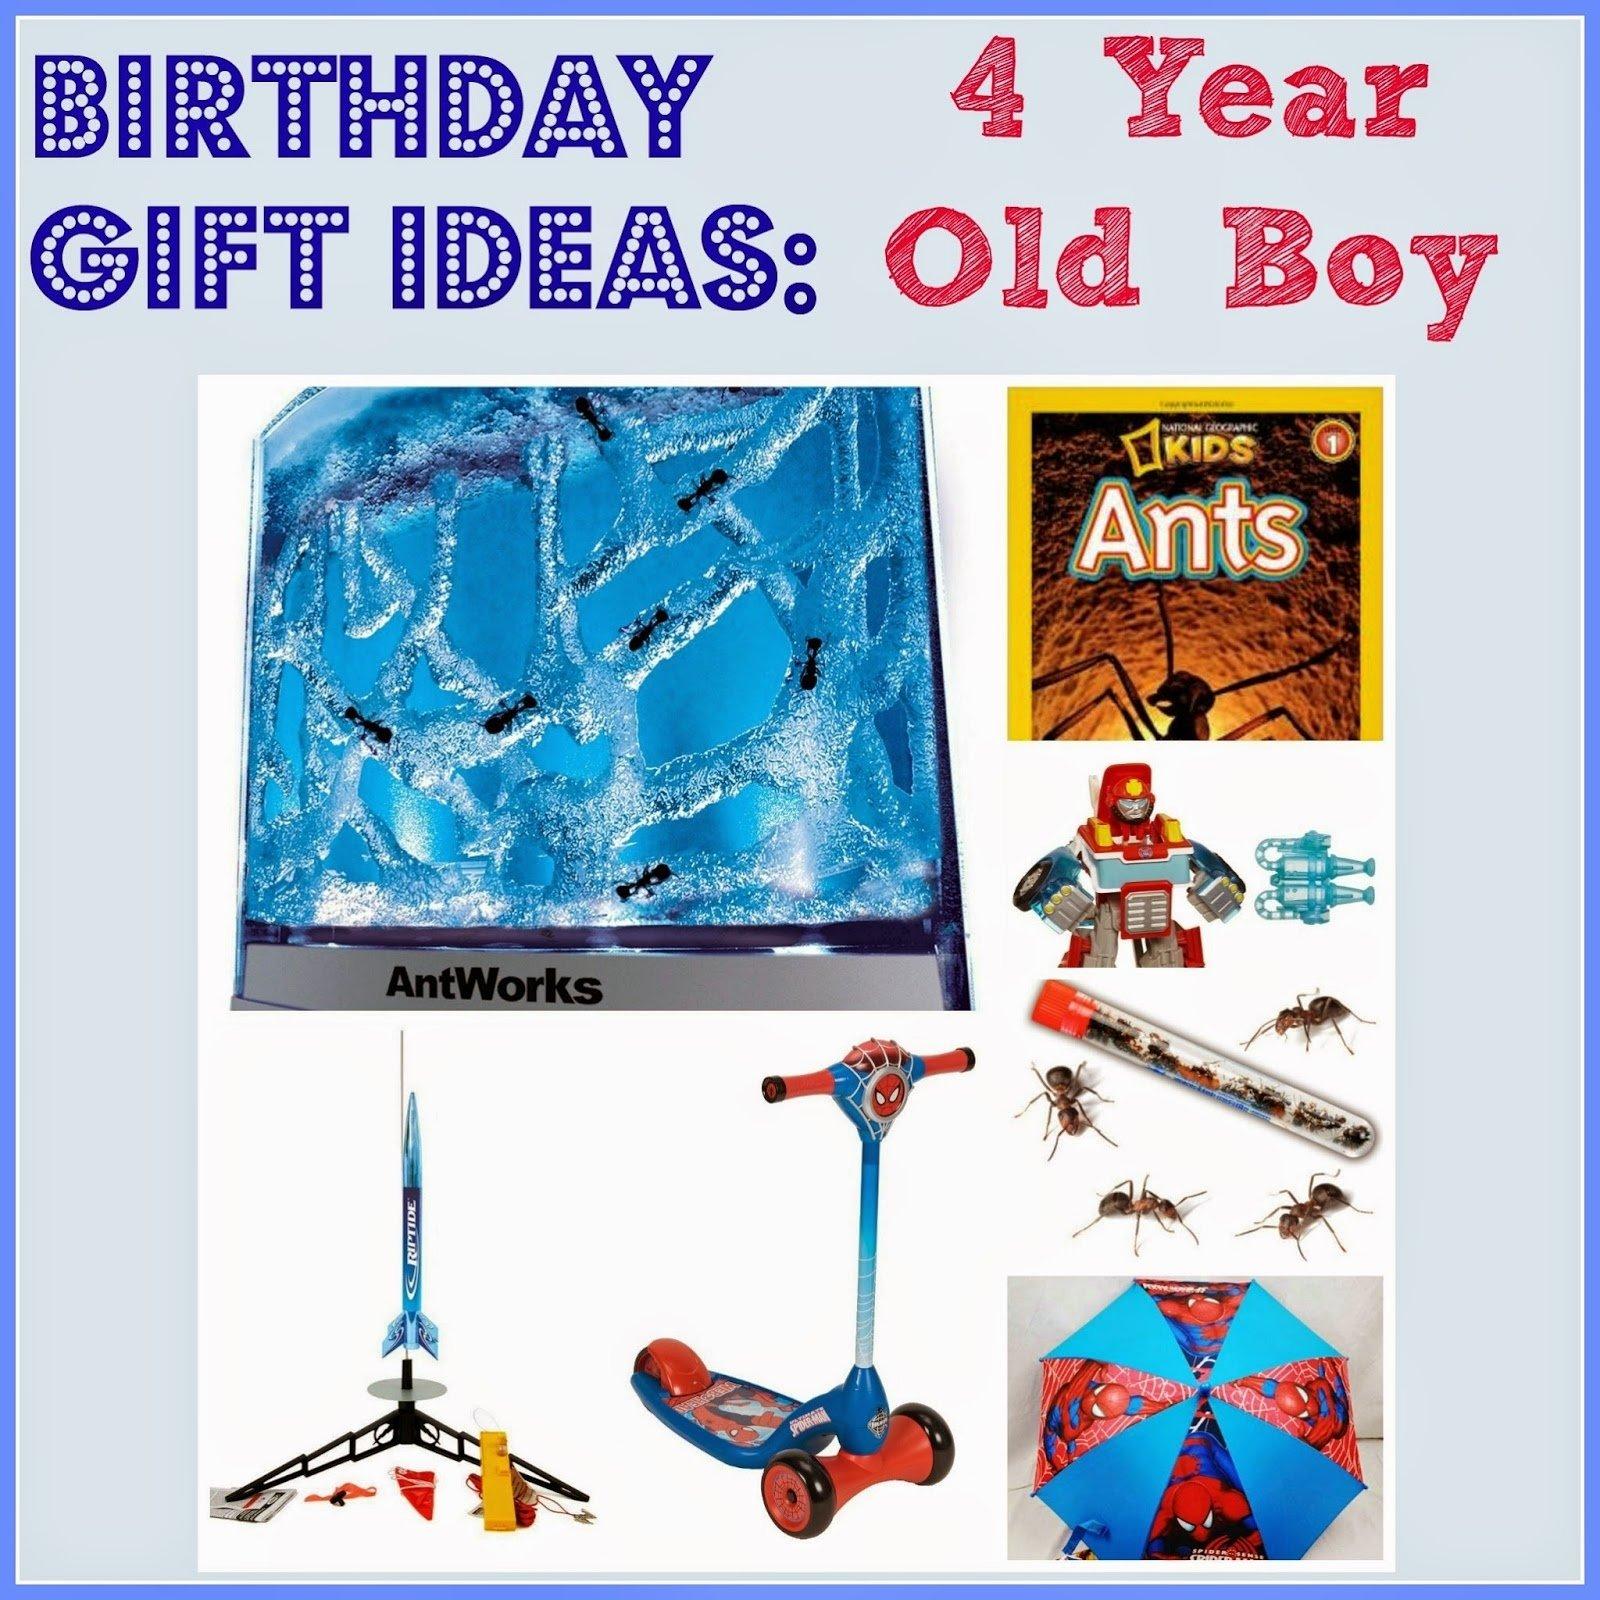 10 Amazing Gift Idea For 4 Year Old Boy year old boy birthday gift ideas home design ideas 9 2020